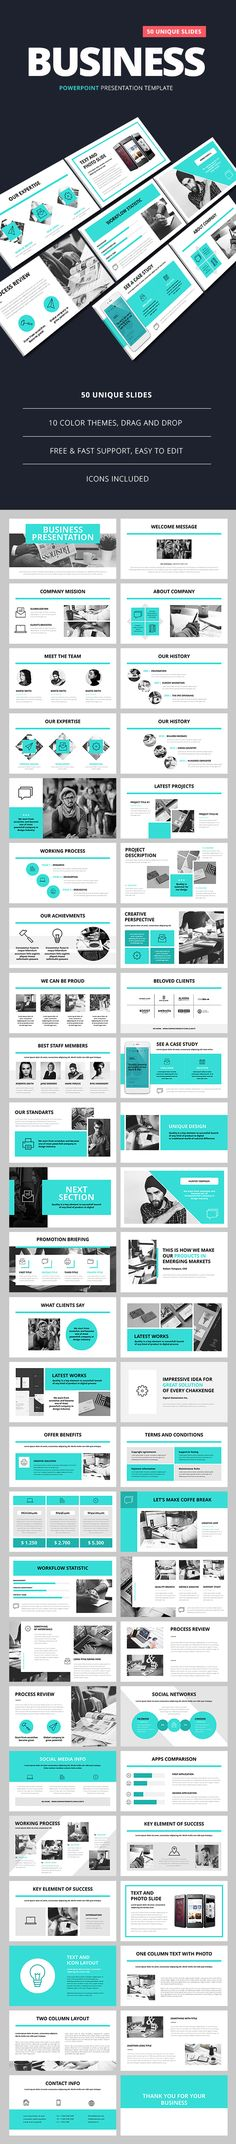 Business Presentation - Business PowerPoint Templates